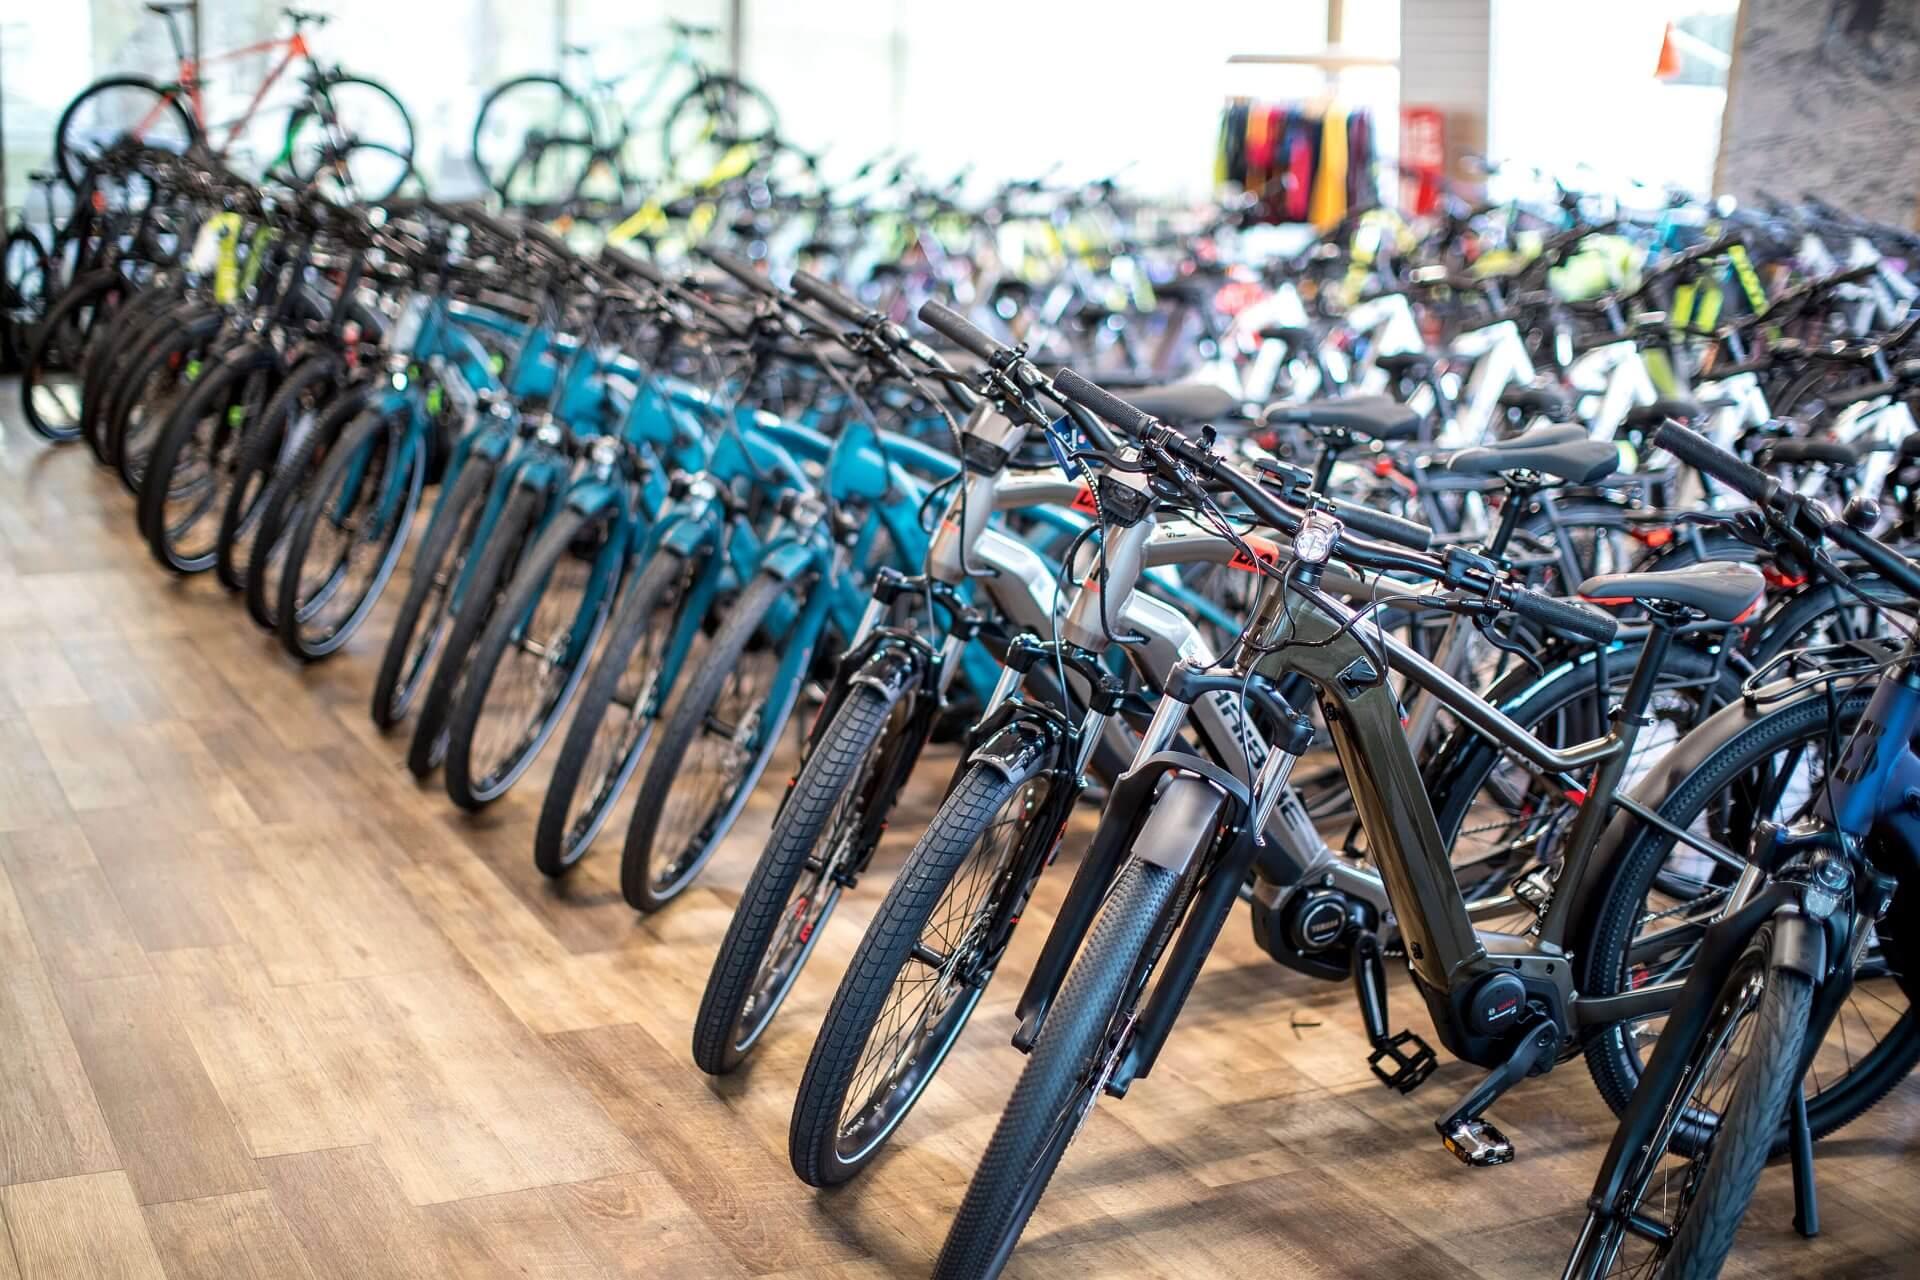 fahrrad cannondale kaufen warendorf